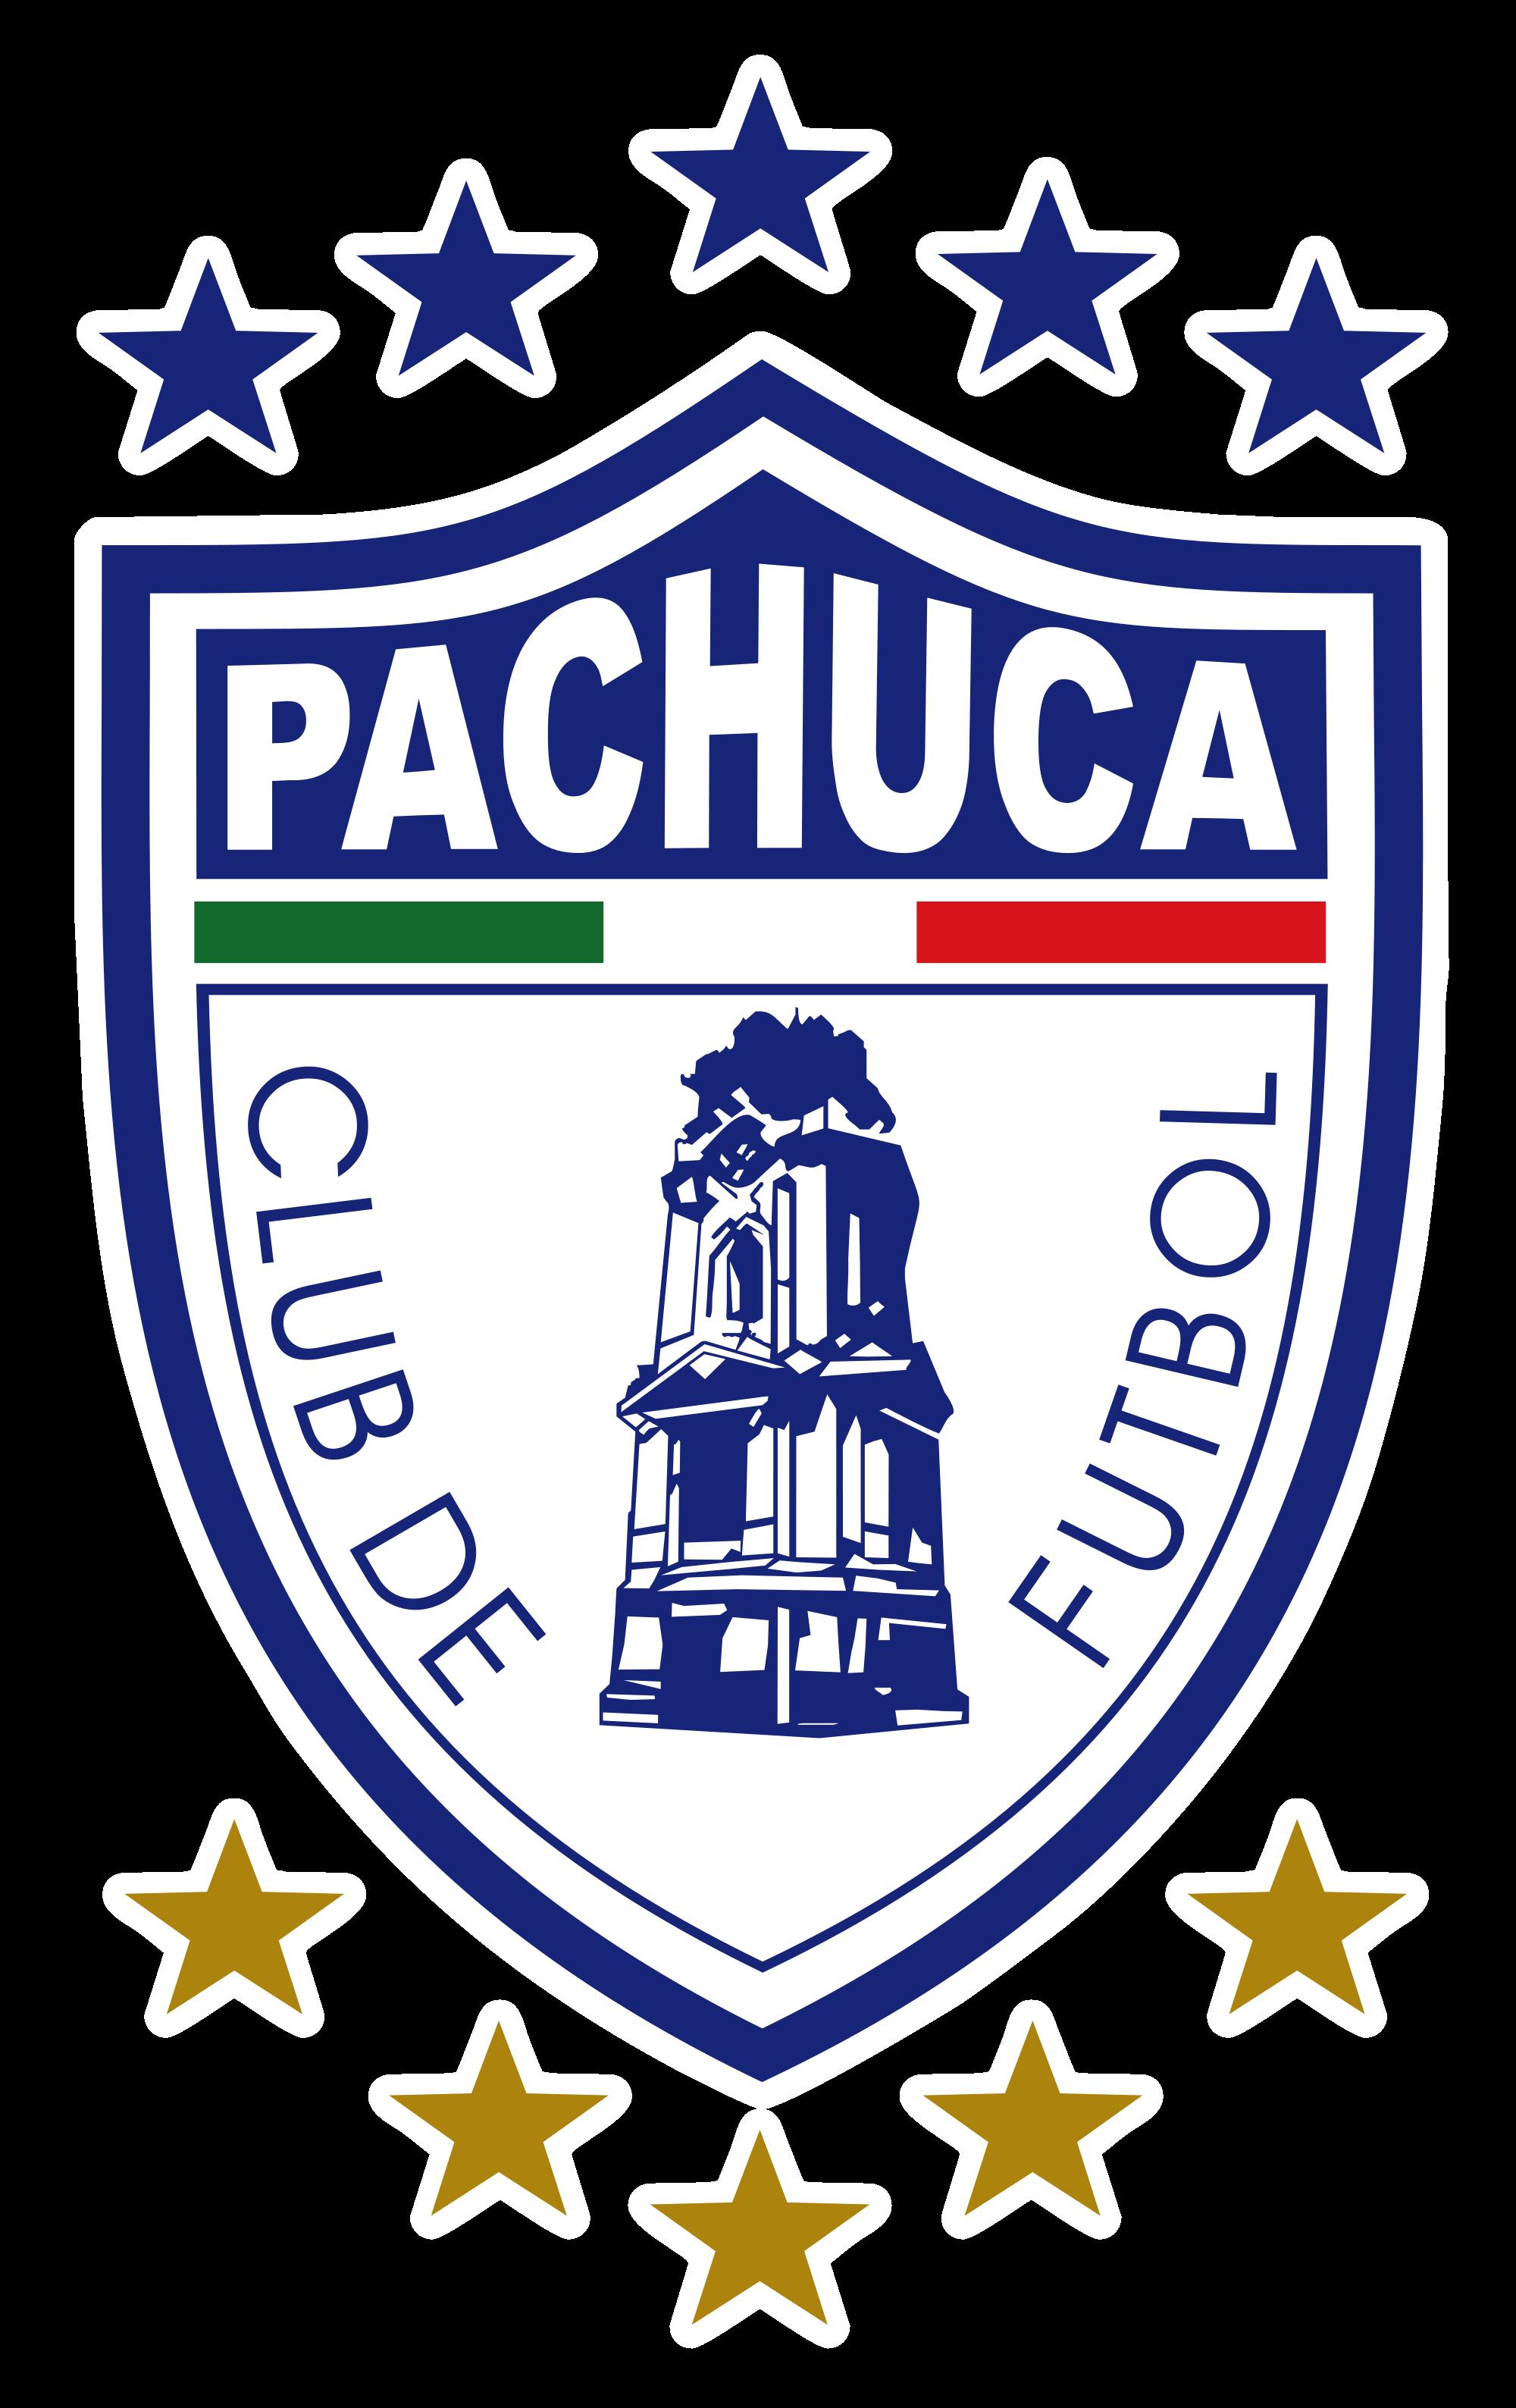 C.F. Pachuca (Liga MX) (With images) Football team logos